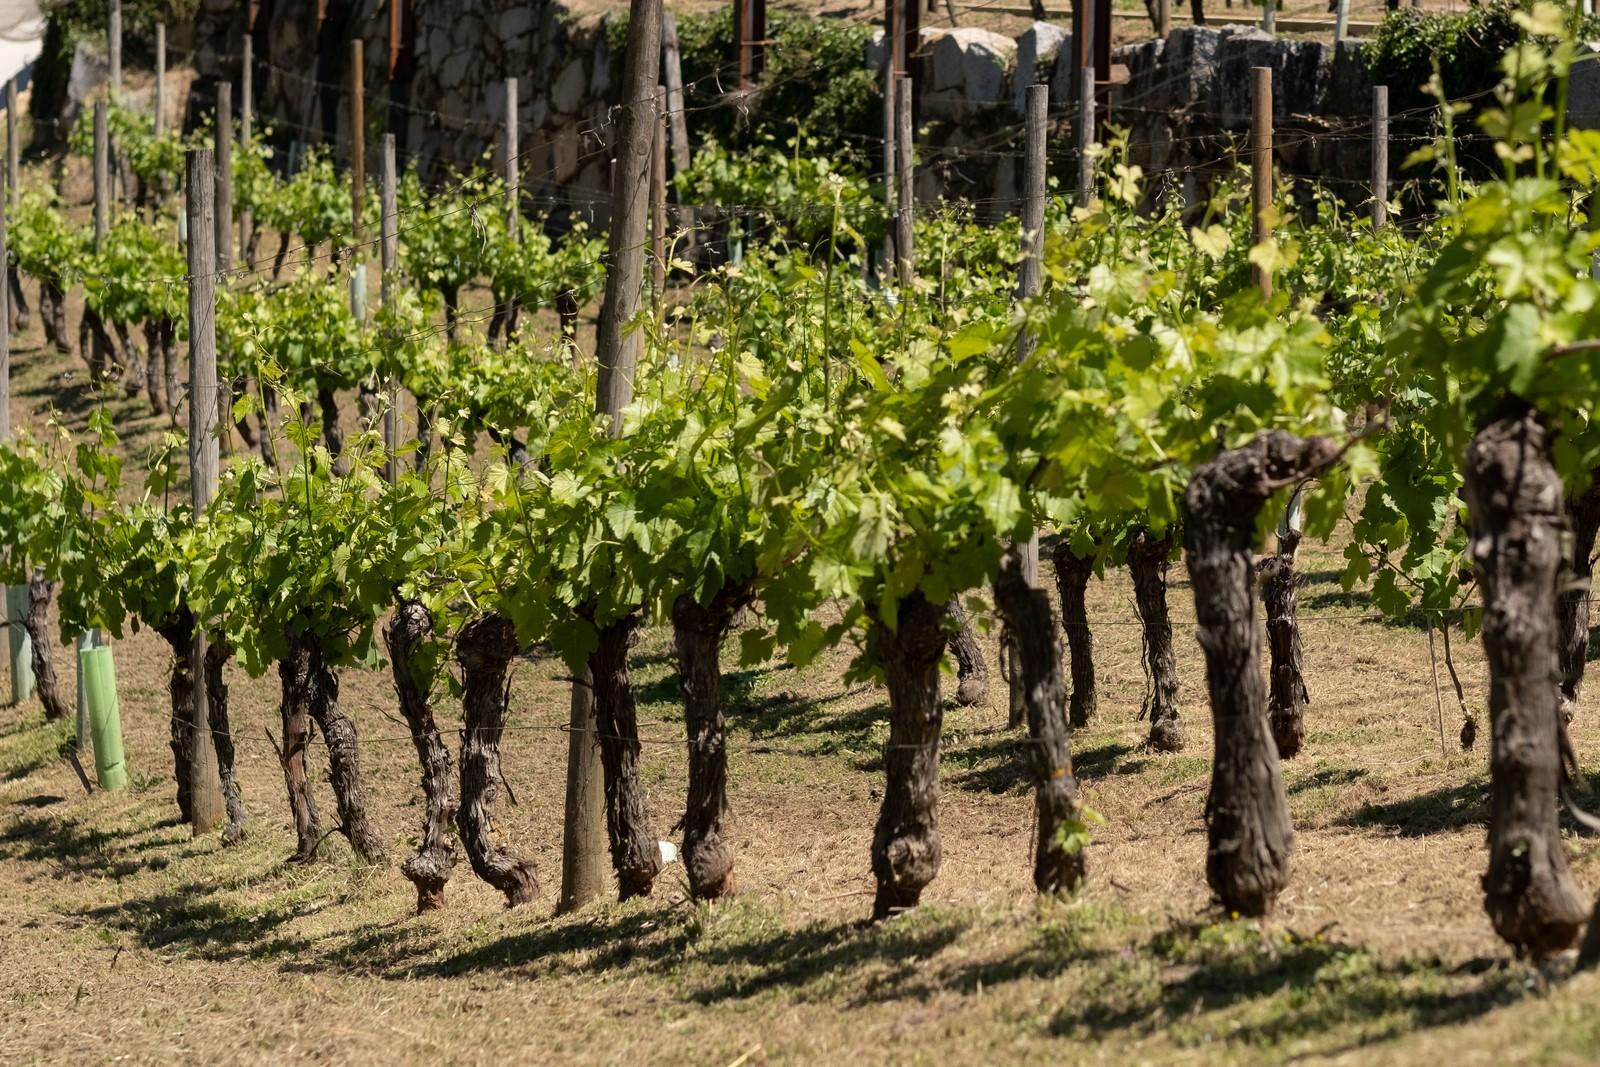 La Xunta invertirá 130.000 euros en la señalización de la Ruta do Viño Ribeira Sacra